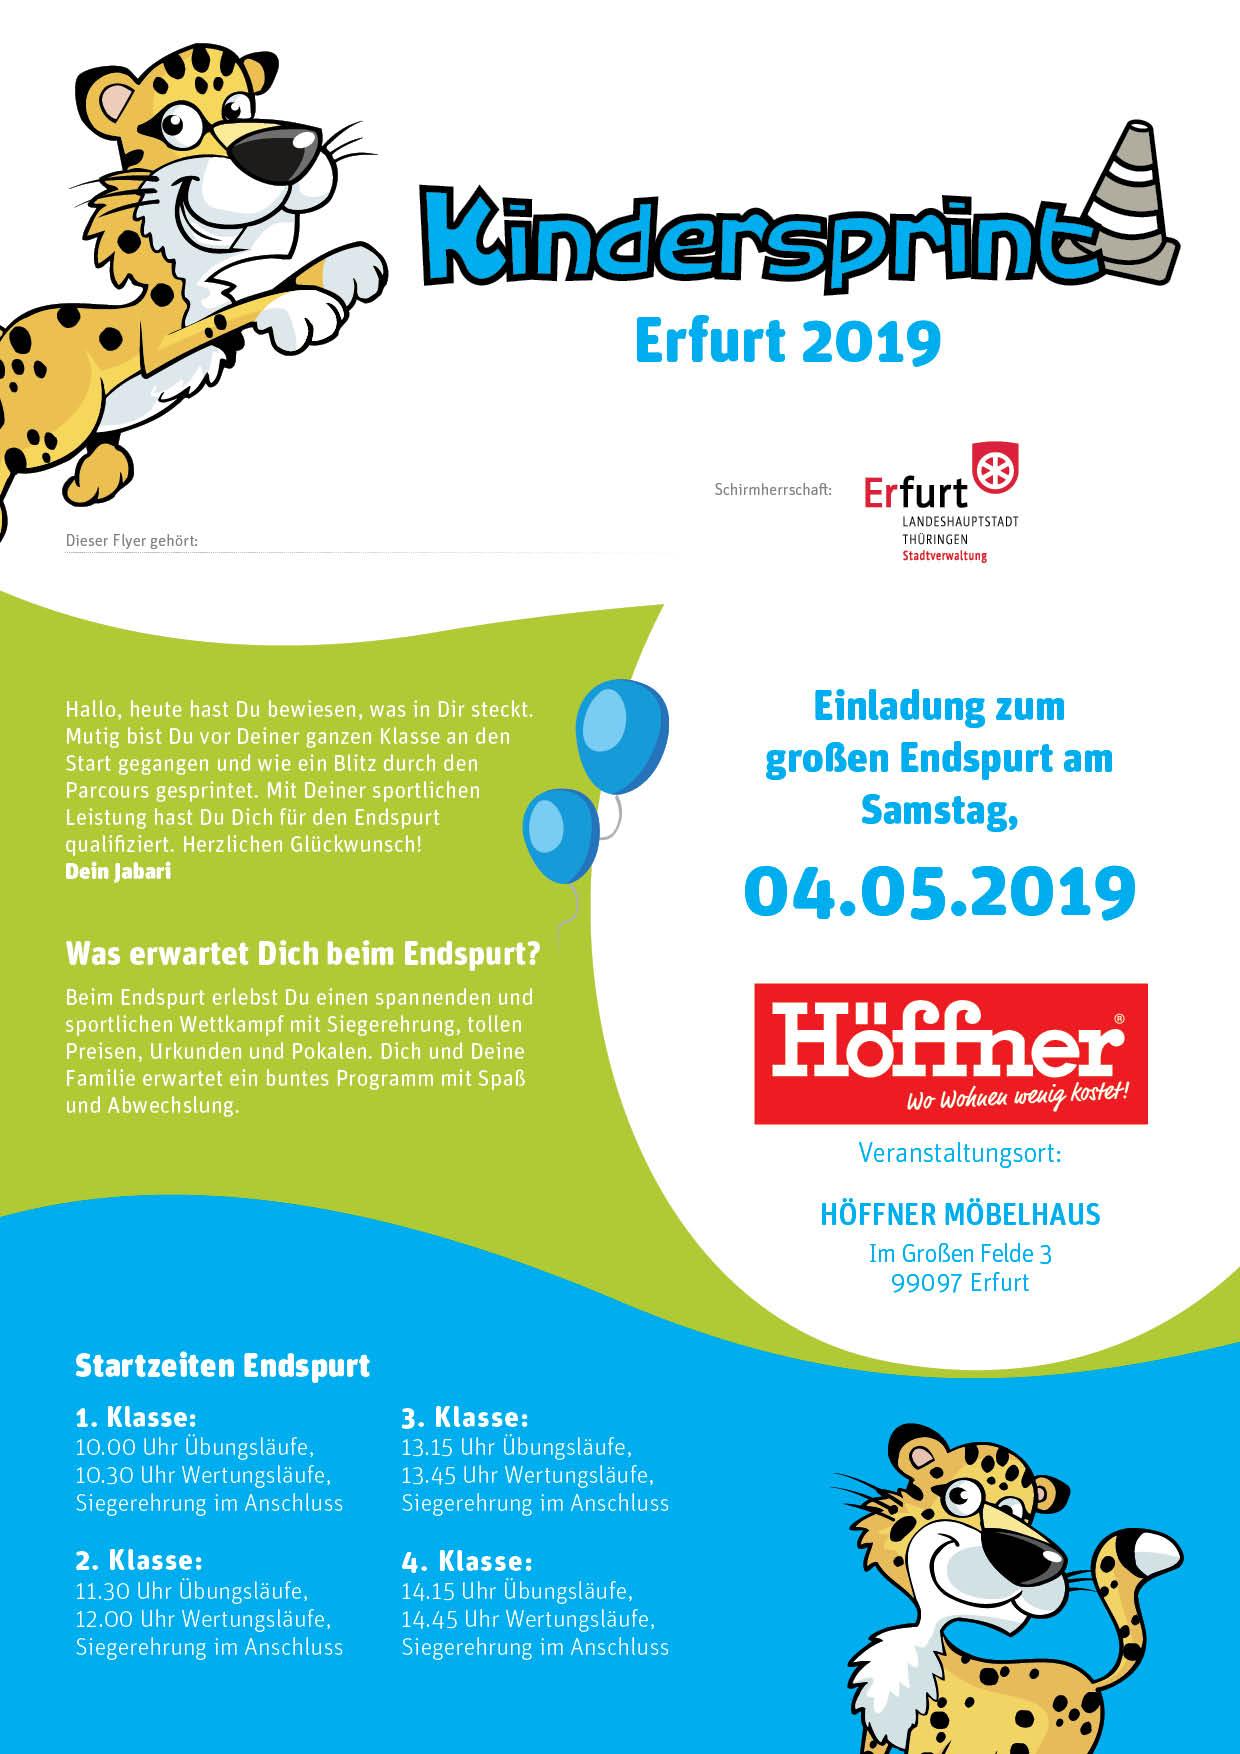 Finale In Erfurt Expikade